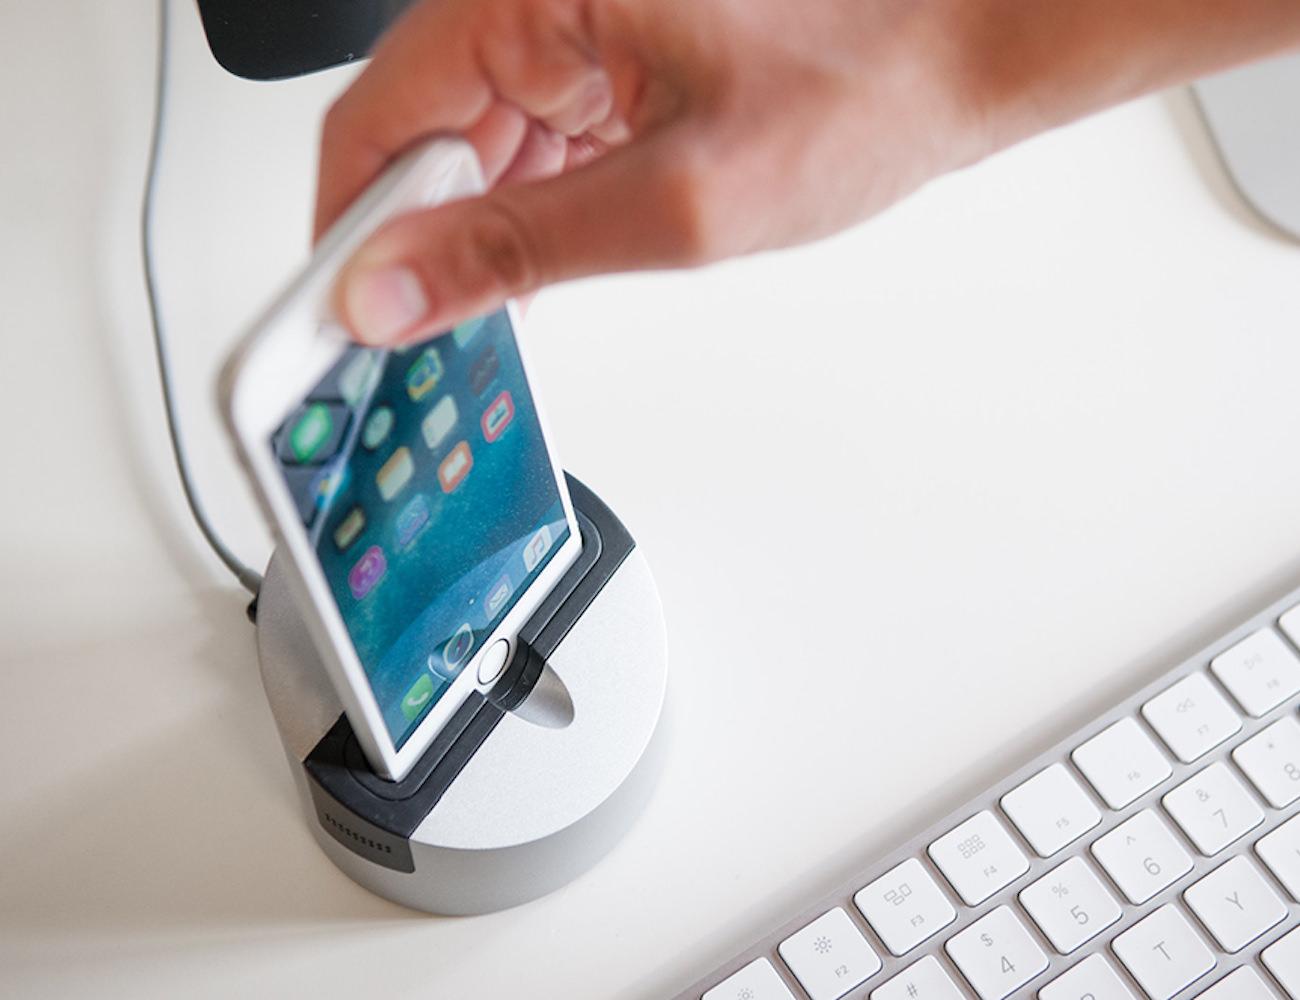 Gravitas2 iPhone and iPad Dock by Henge Docks